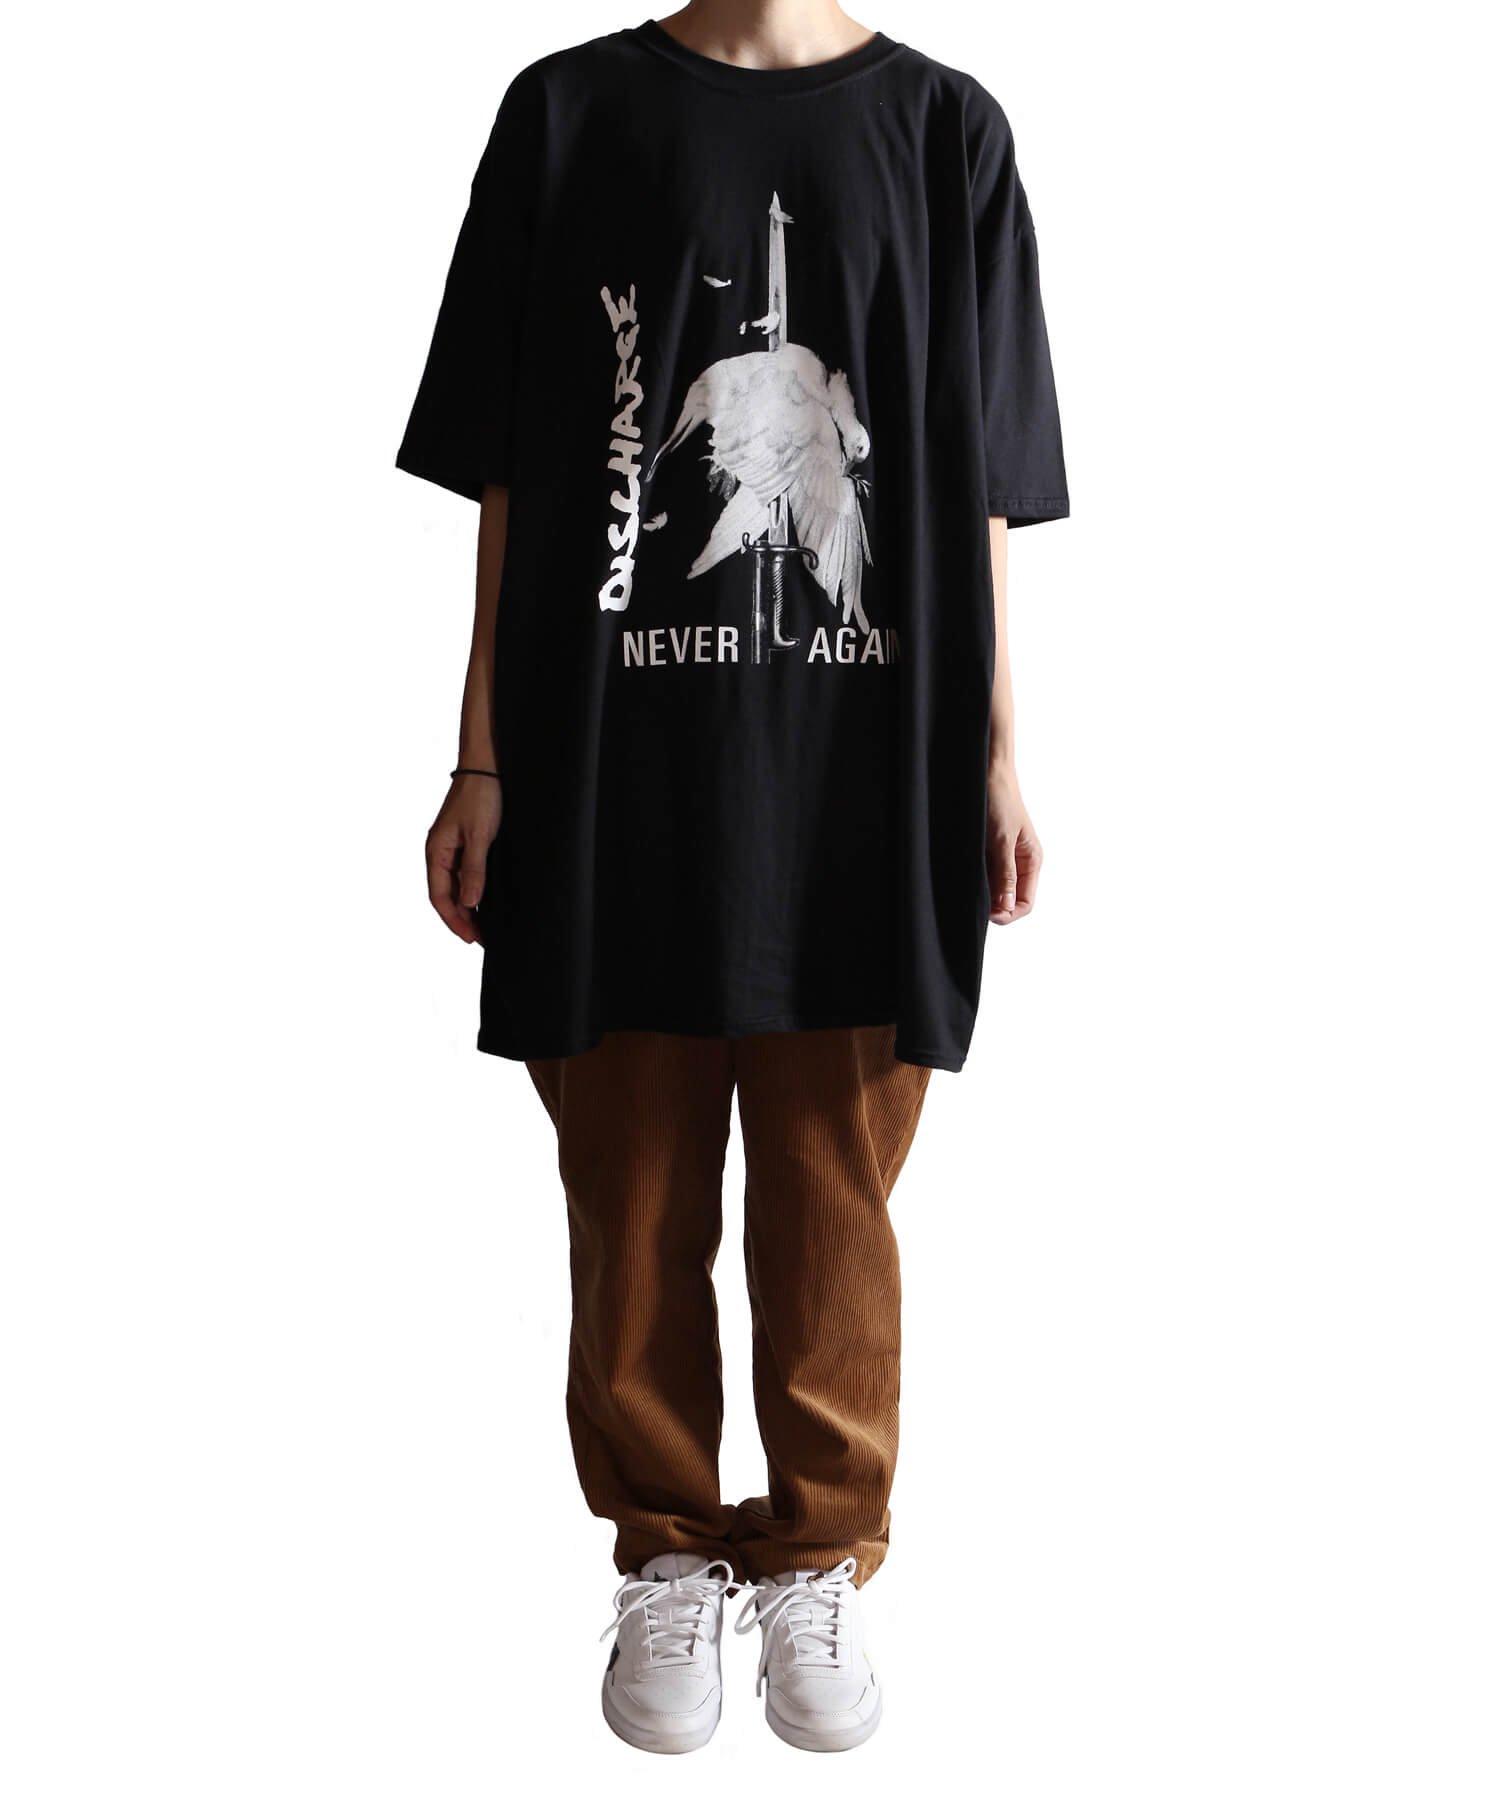 Official Artist Goods / バンドTなど  DISCHARGE / ディスチャージ:NEVER AGAIN T-SHIRT (BLACK)商品画像11